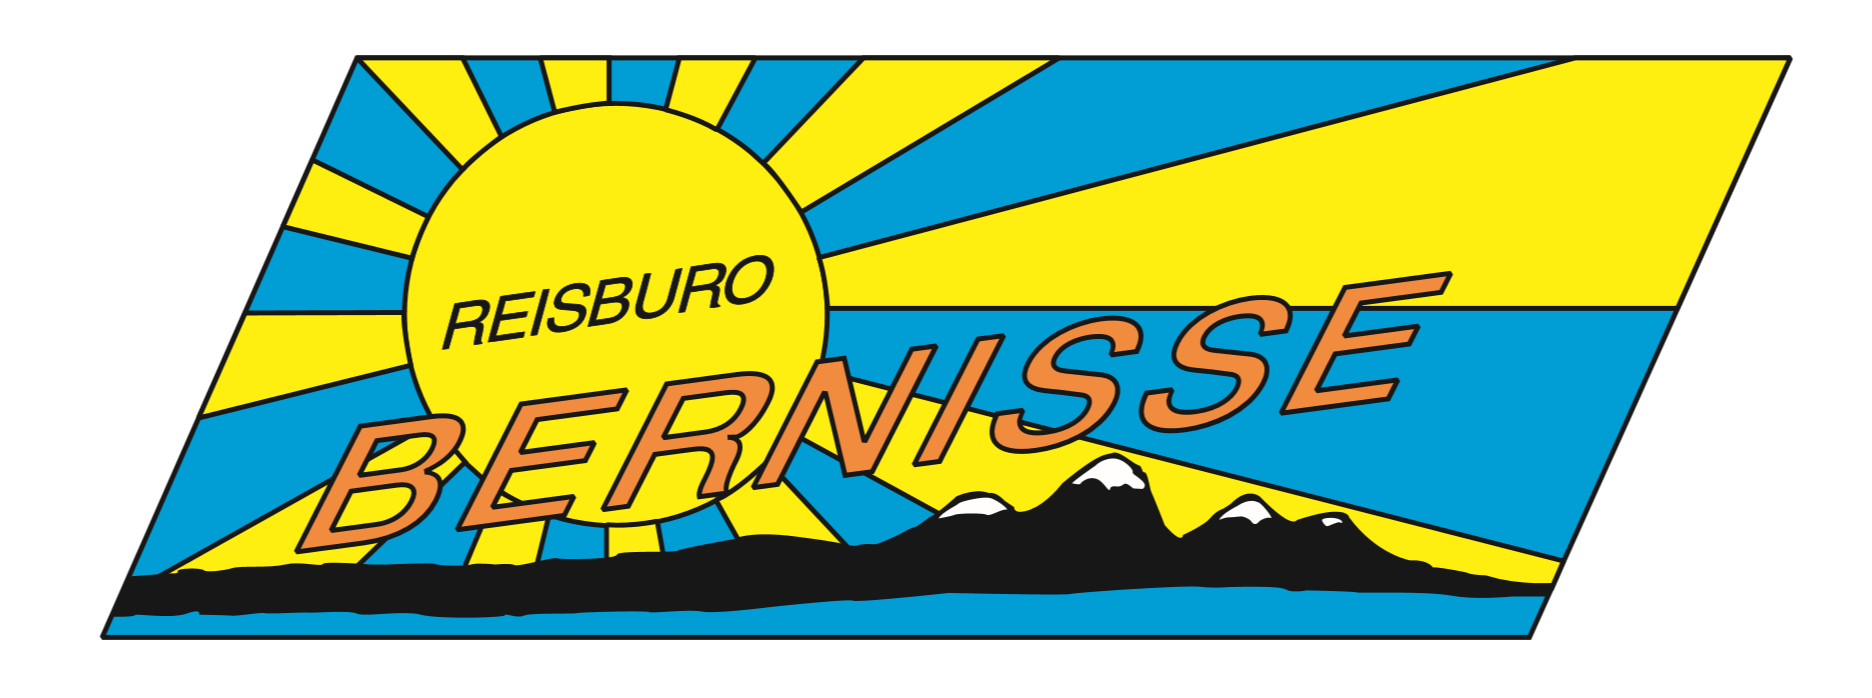 Reisburo Bernisse